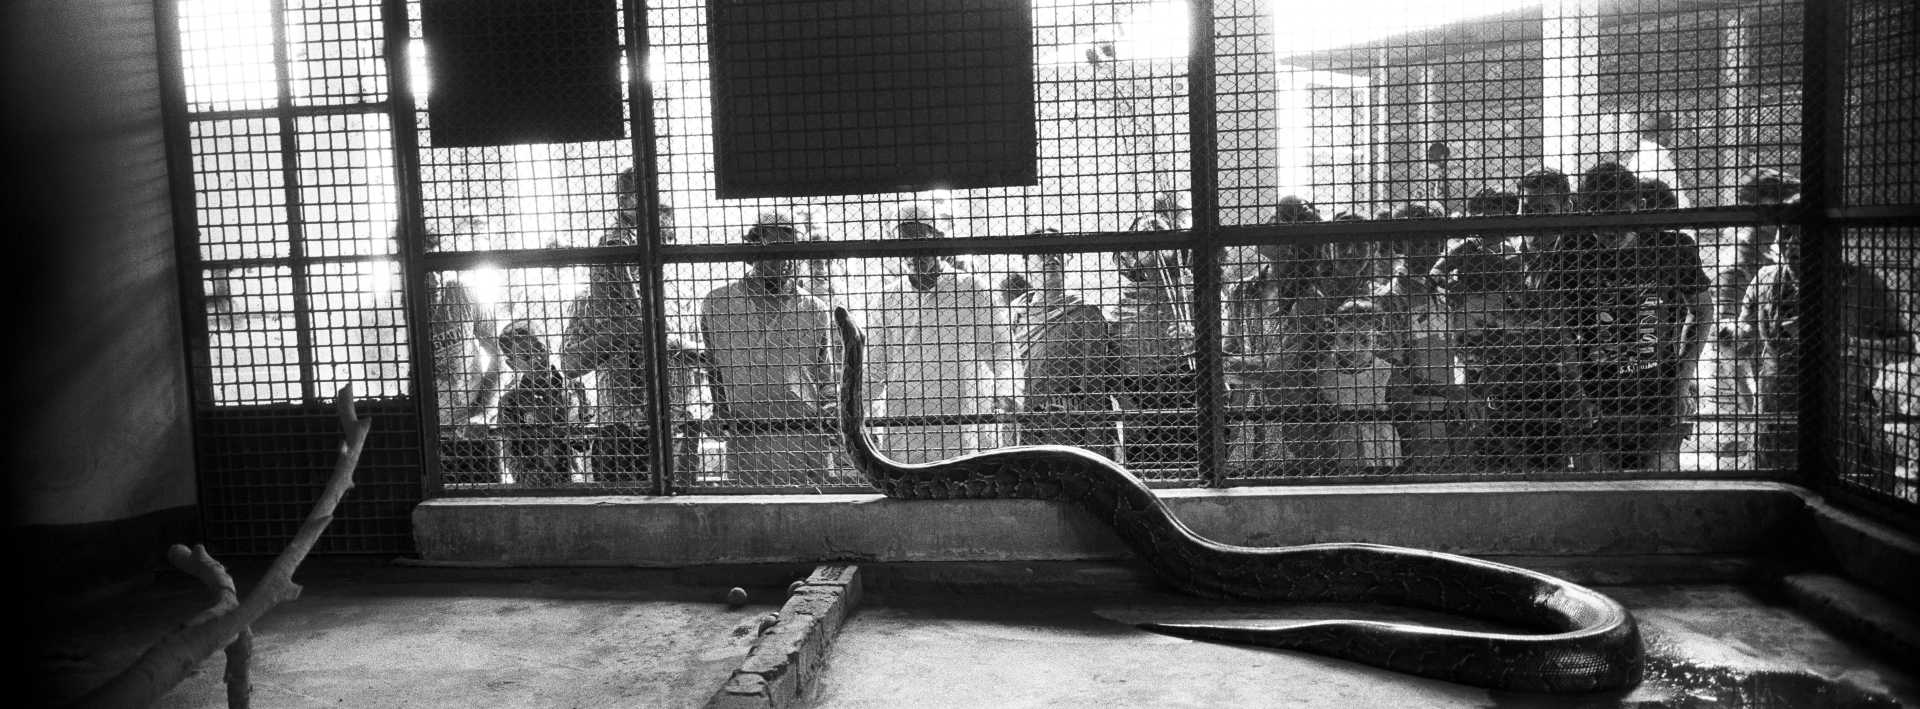 Zoo,Dhaka, Bangladesh.